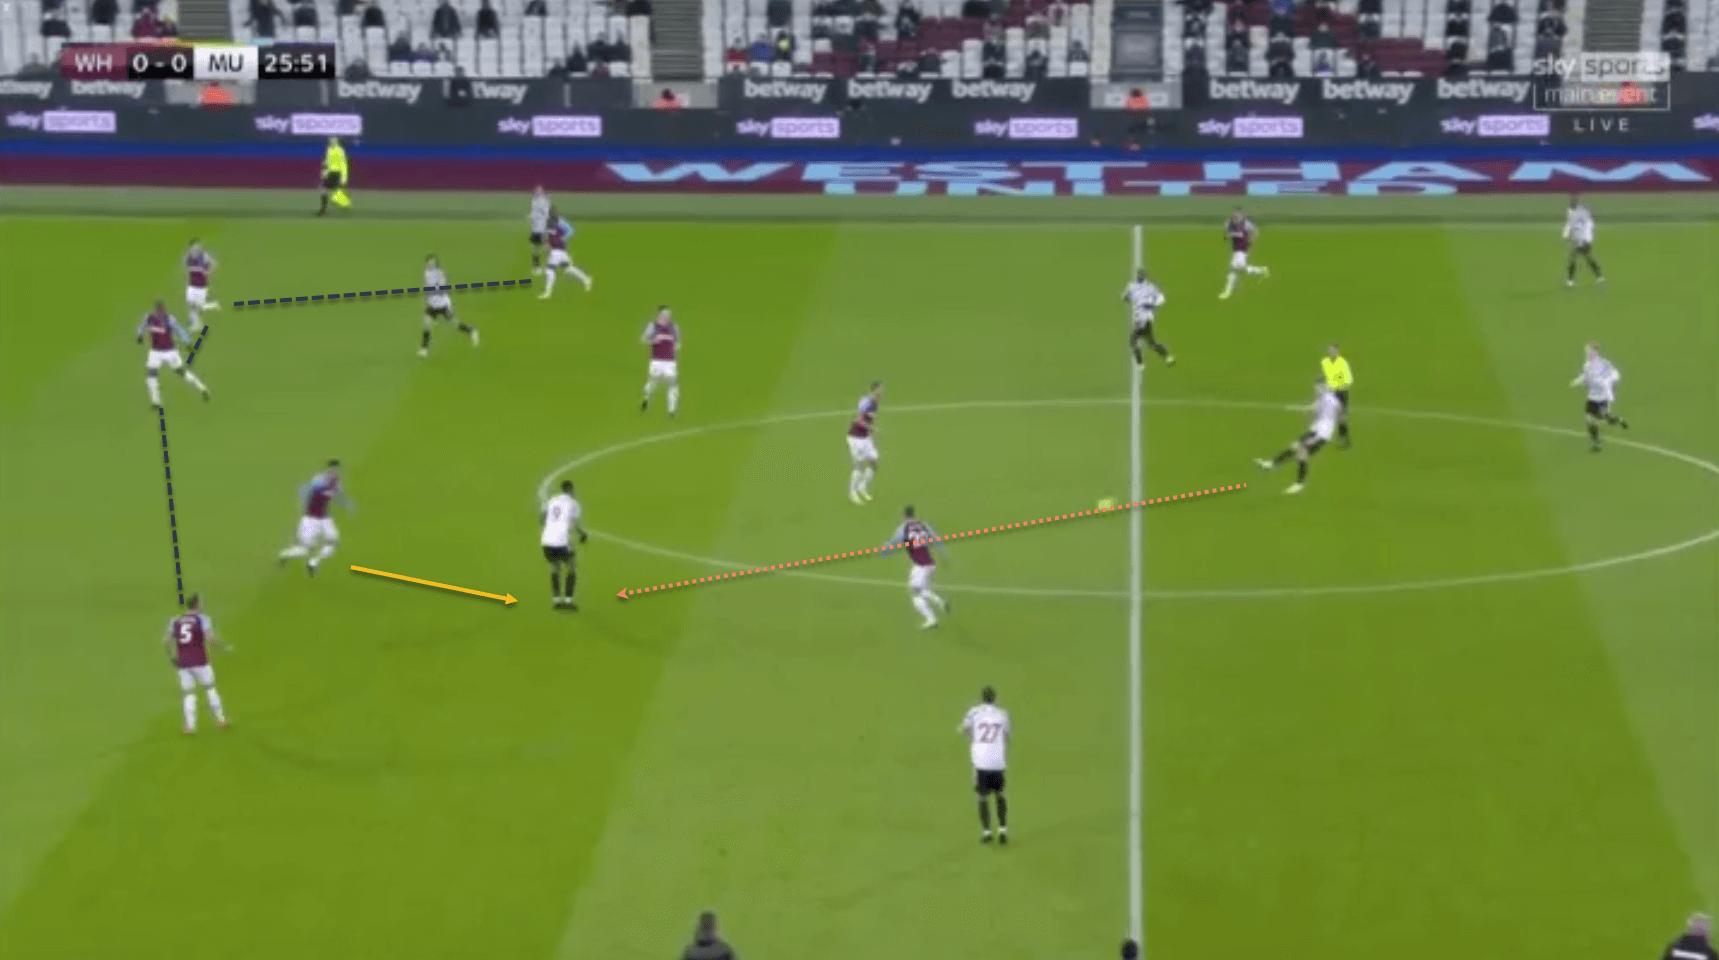 West Ham Premier League David Moyes tactical analysis tactics